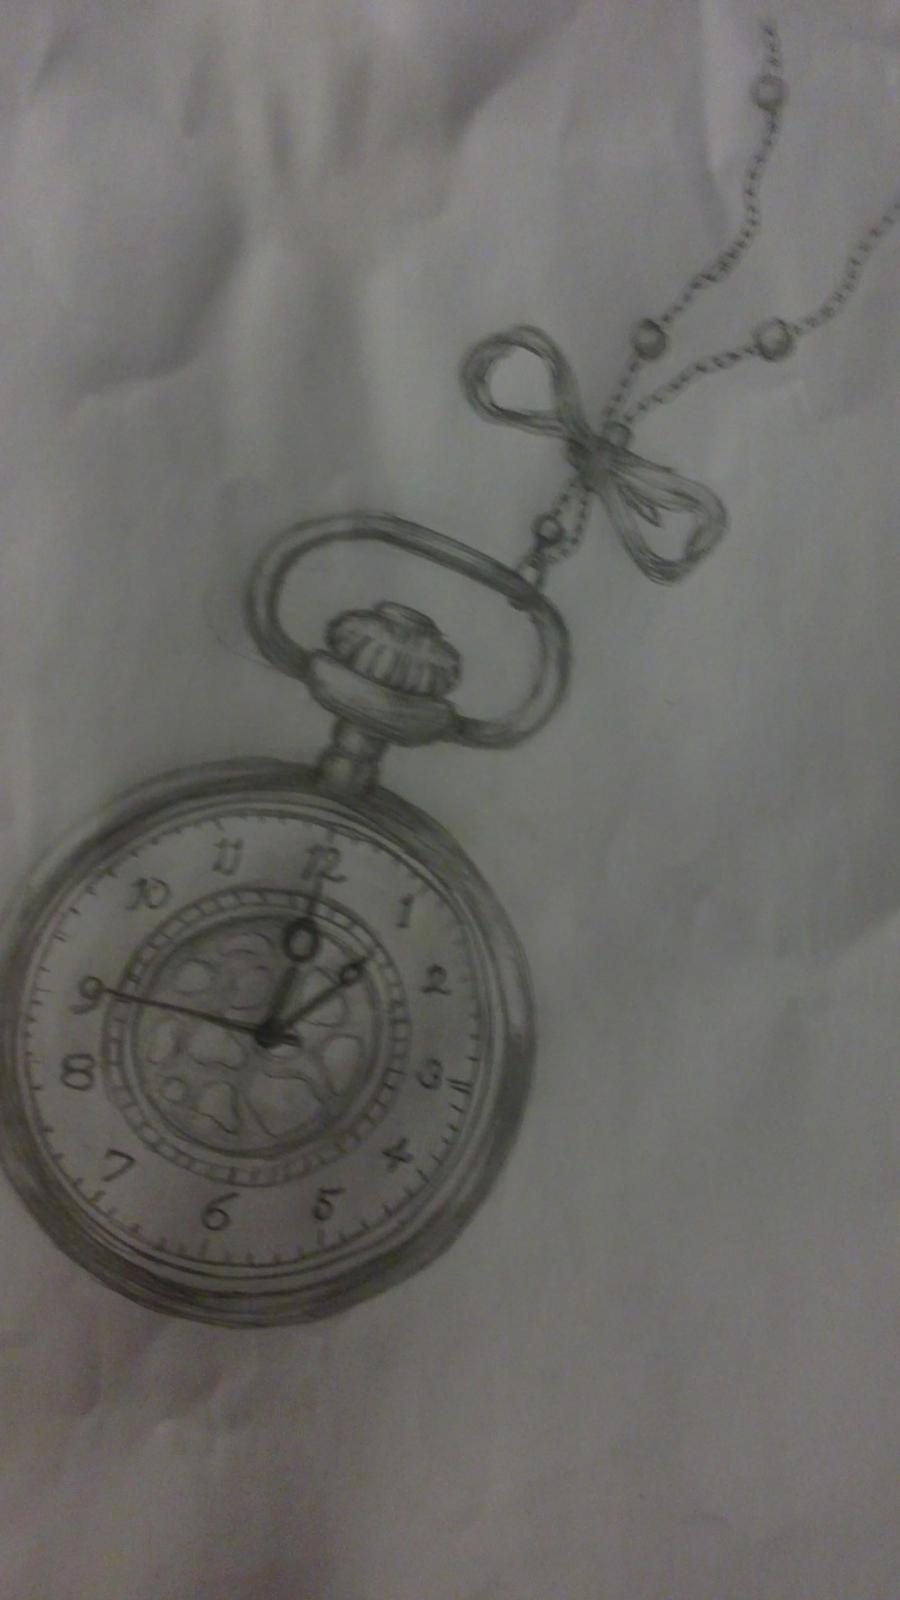 Stop watch tattoo designs by itsonlykim on deviantart for Stop watch tattoos